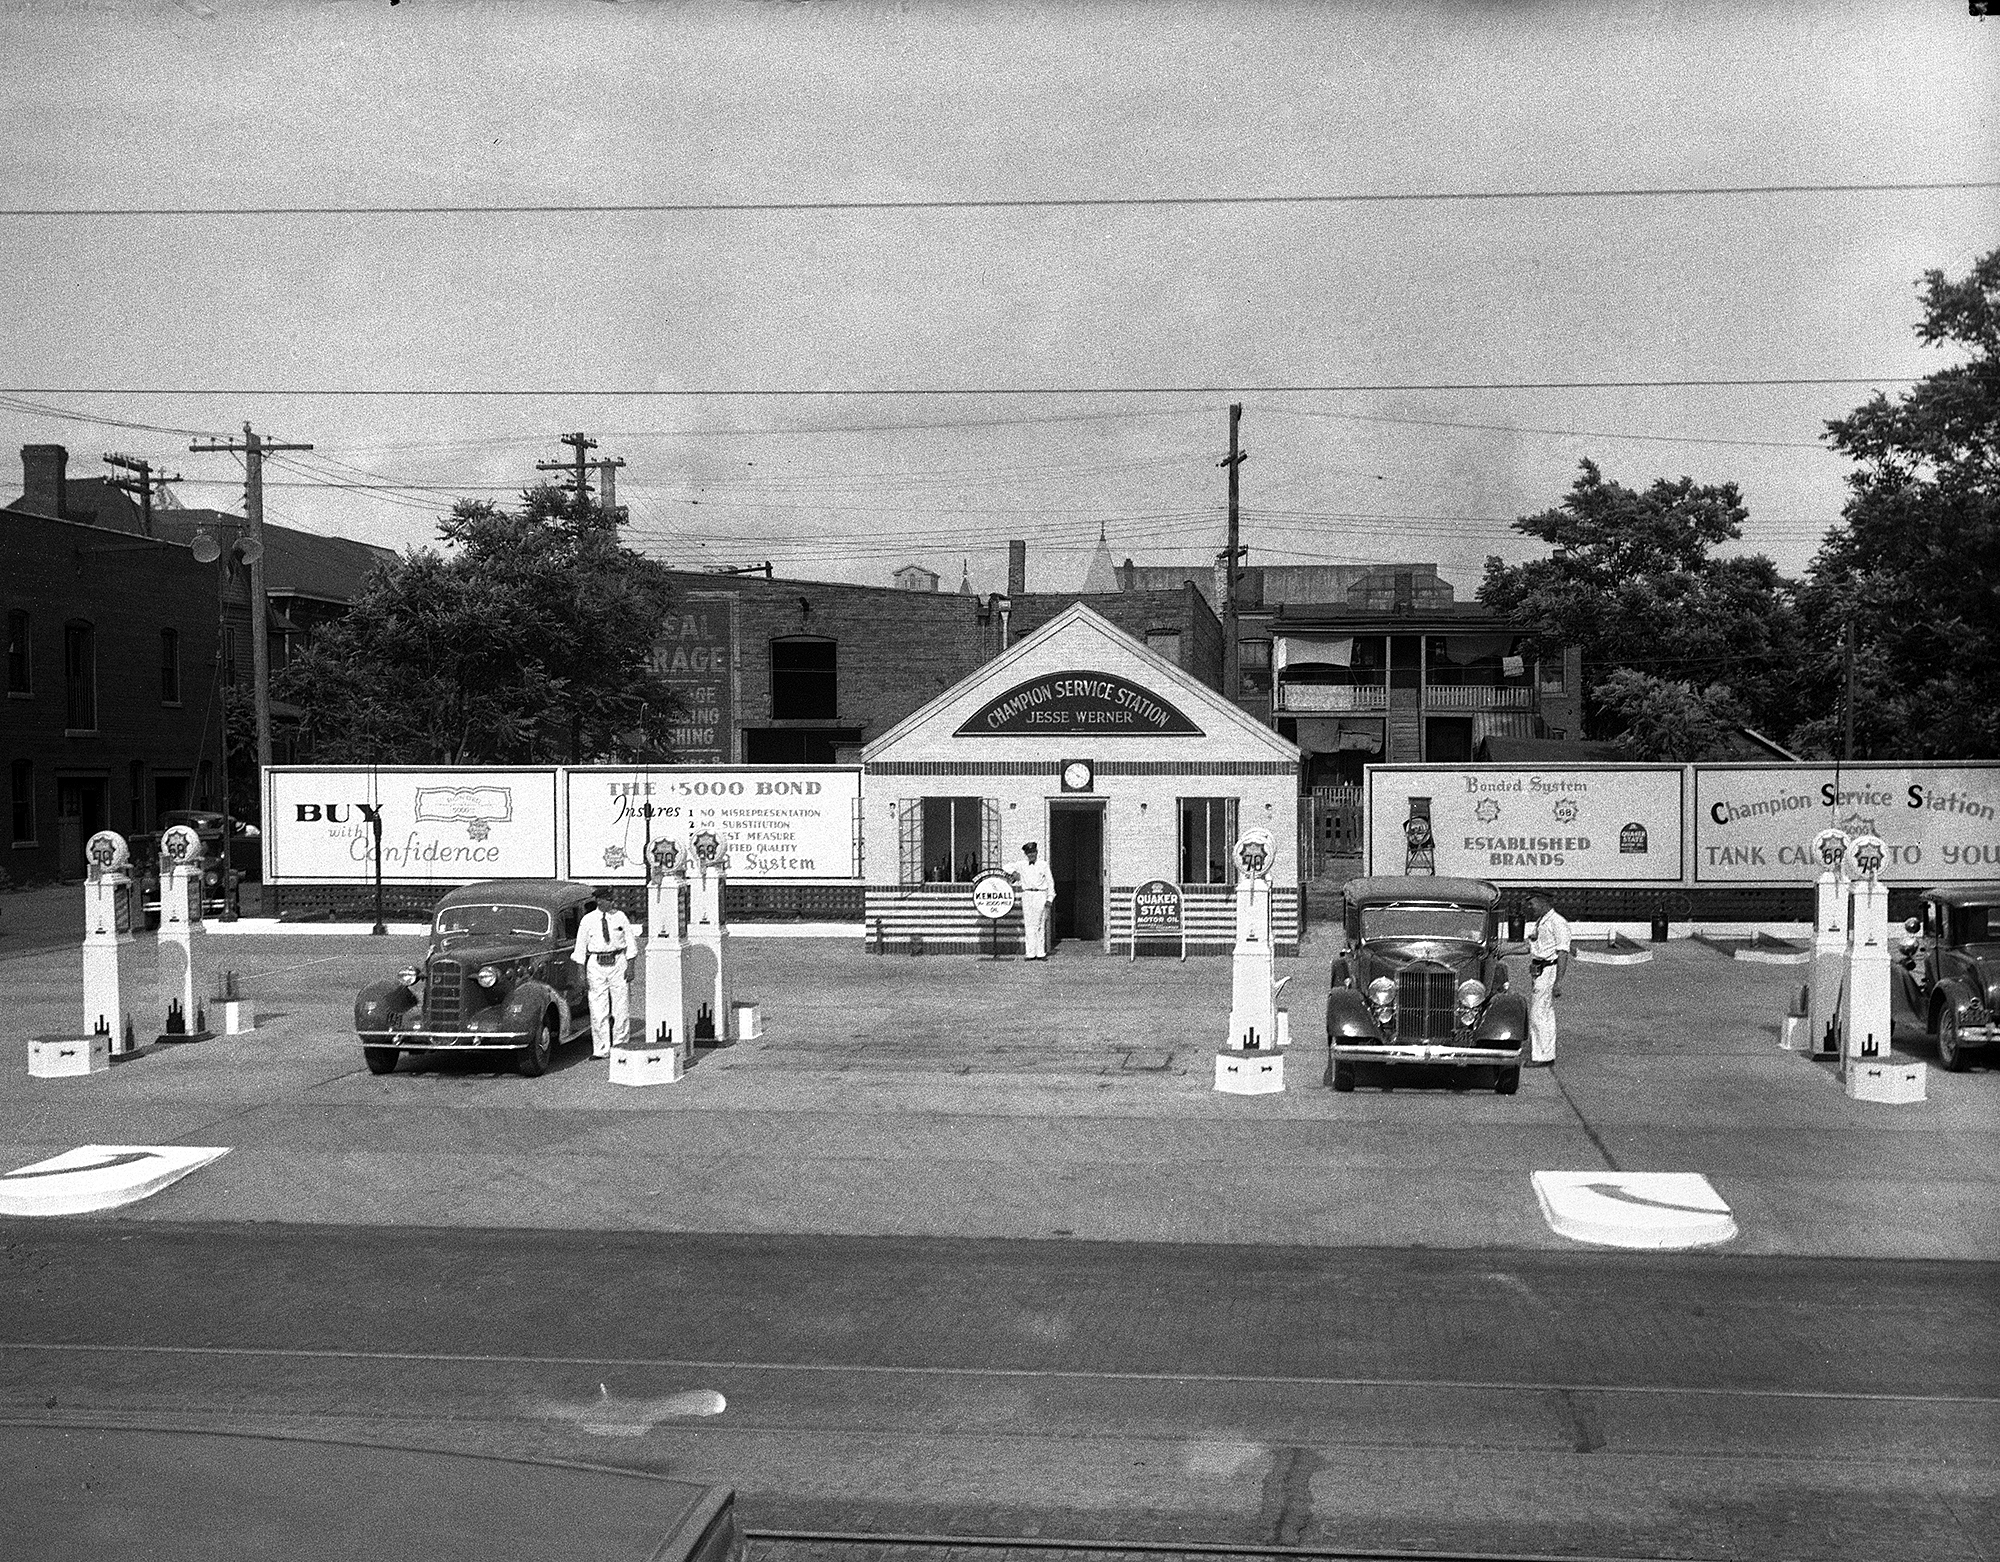 Jess Werner Champion Service Station, 1101 W. Jefferson St., circa 1930s.